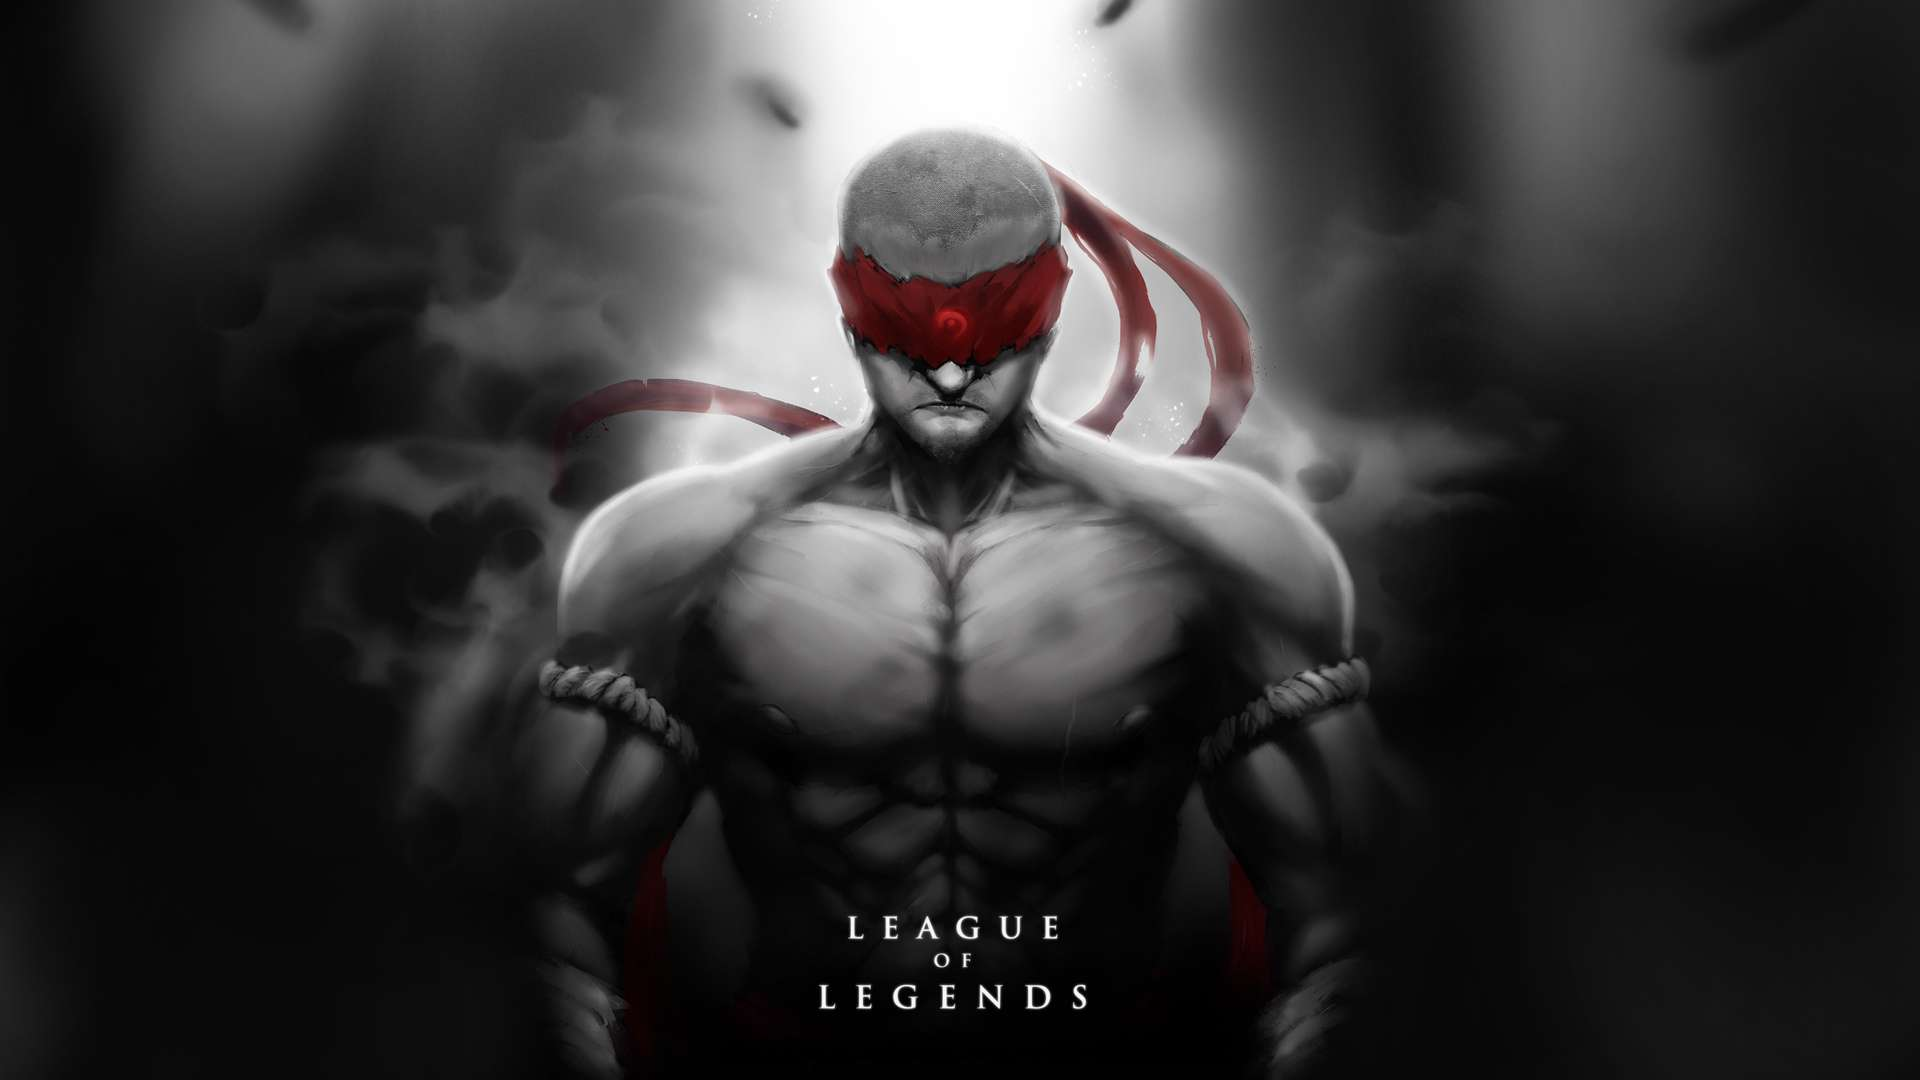 League of Legends Wallpaper 144